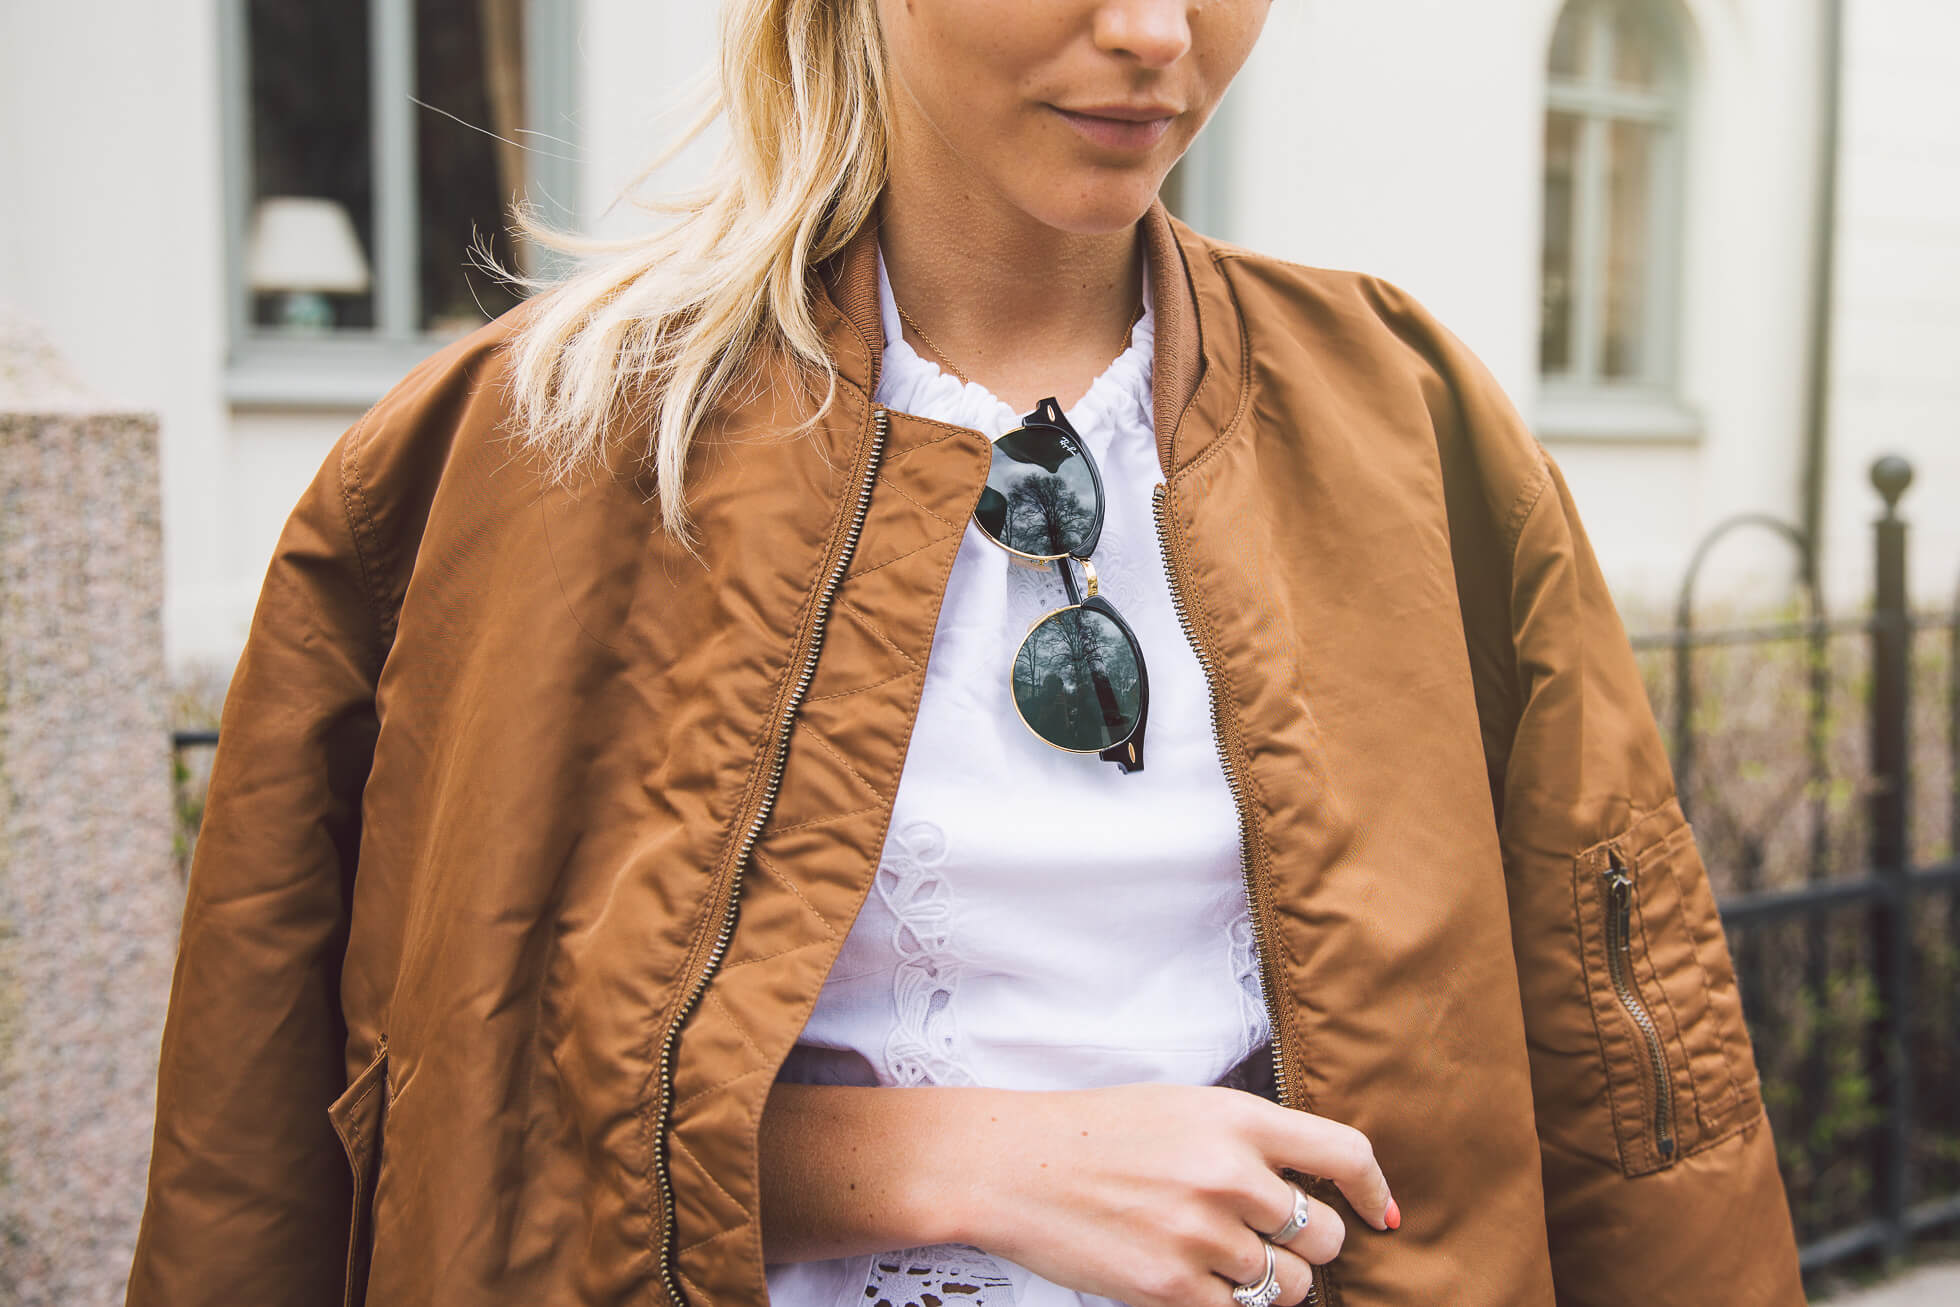 janni-deler-loveeyewear-rayban8S0A8480-Redigera